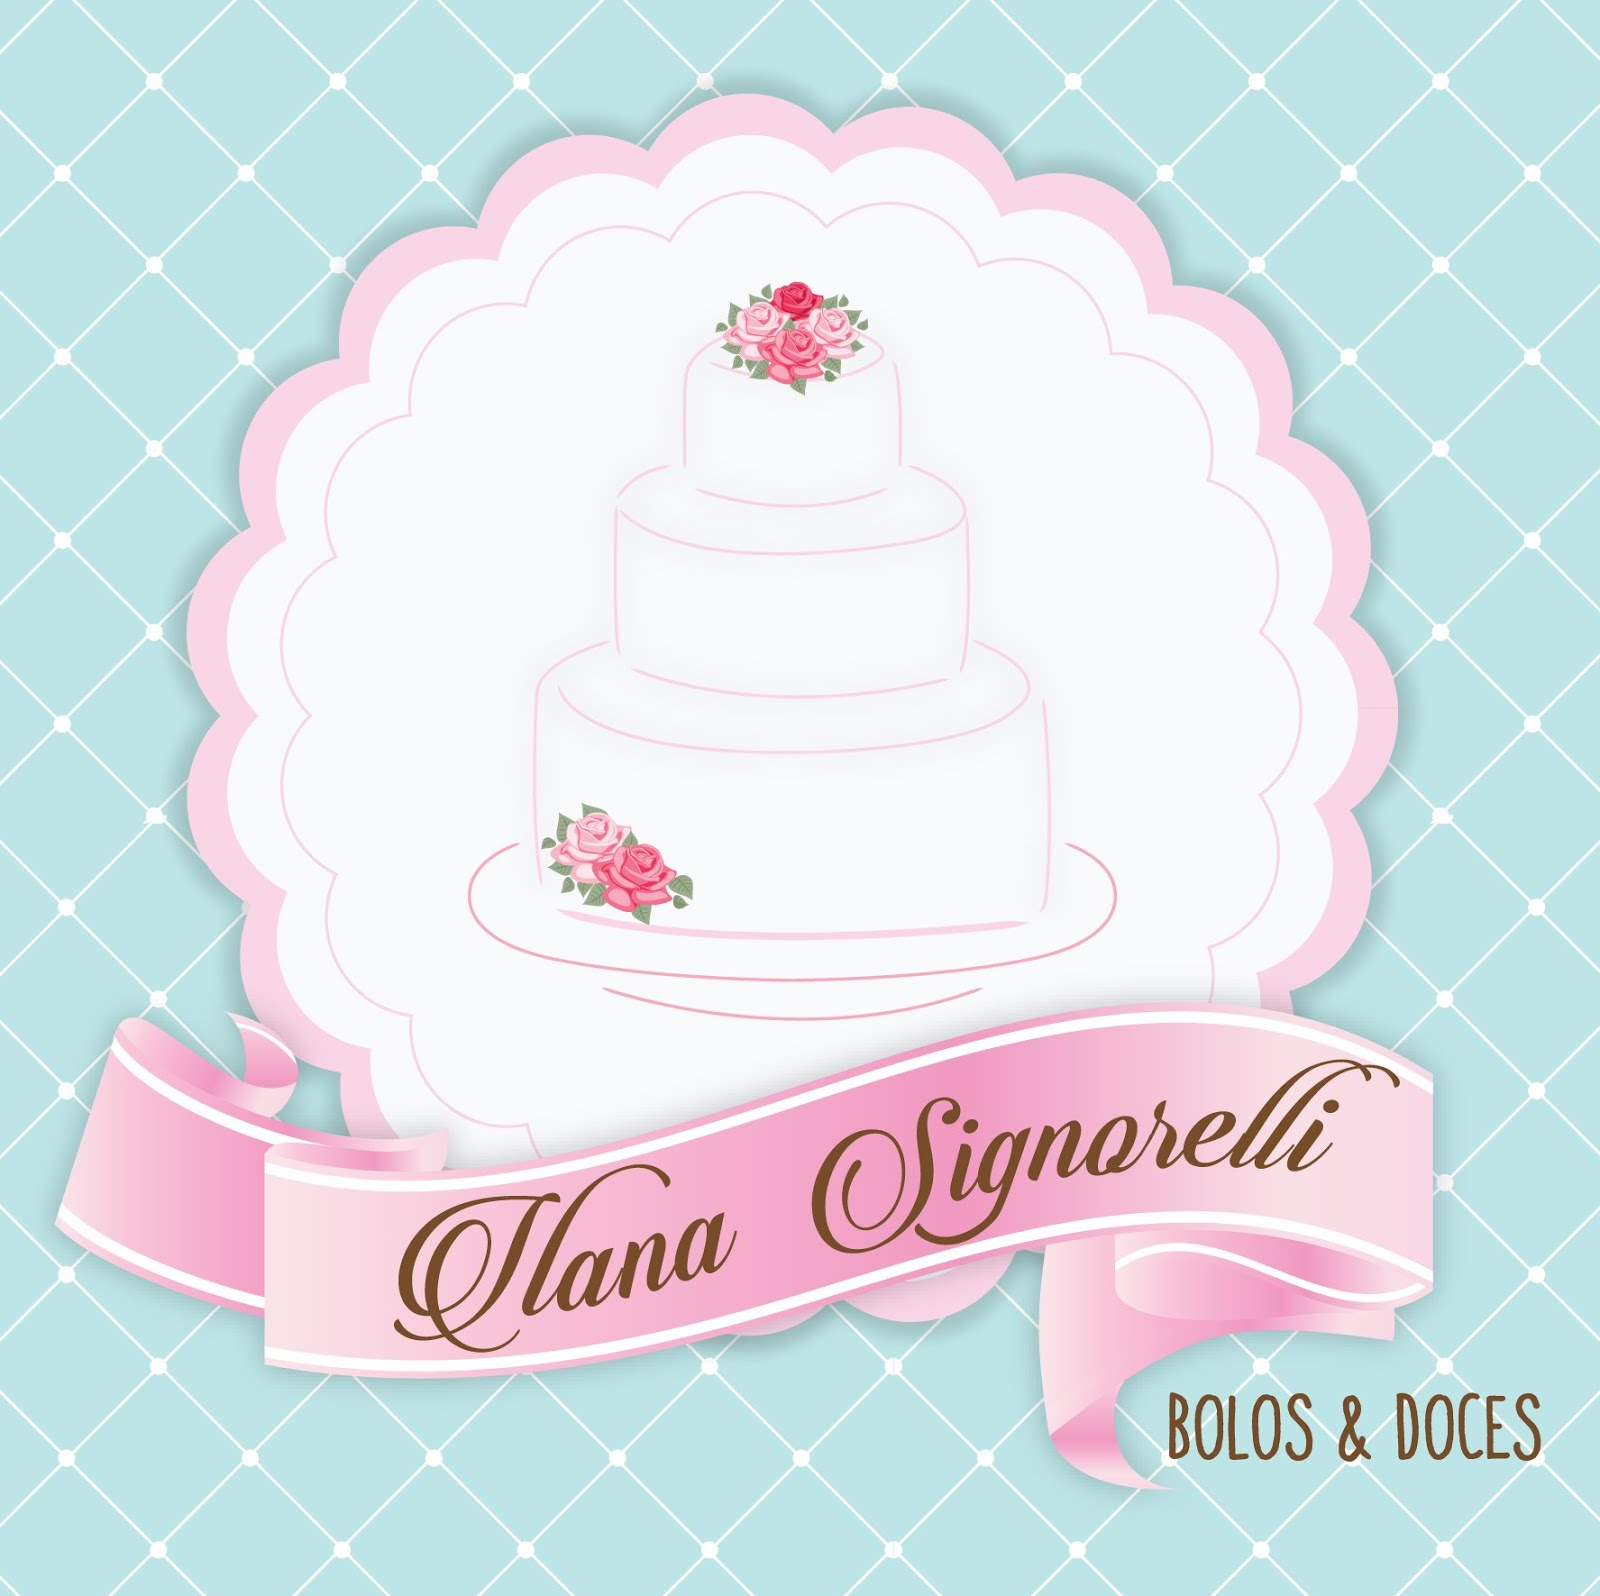 Ilana Signorelli Bolos & Doces